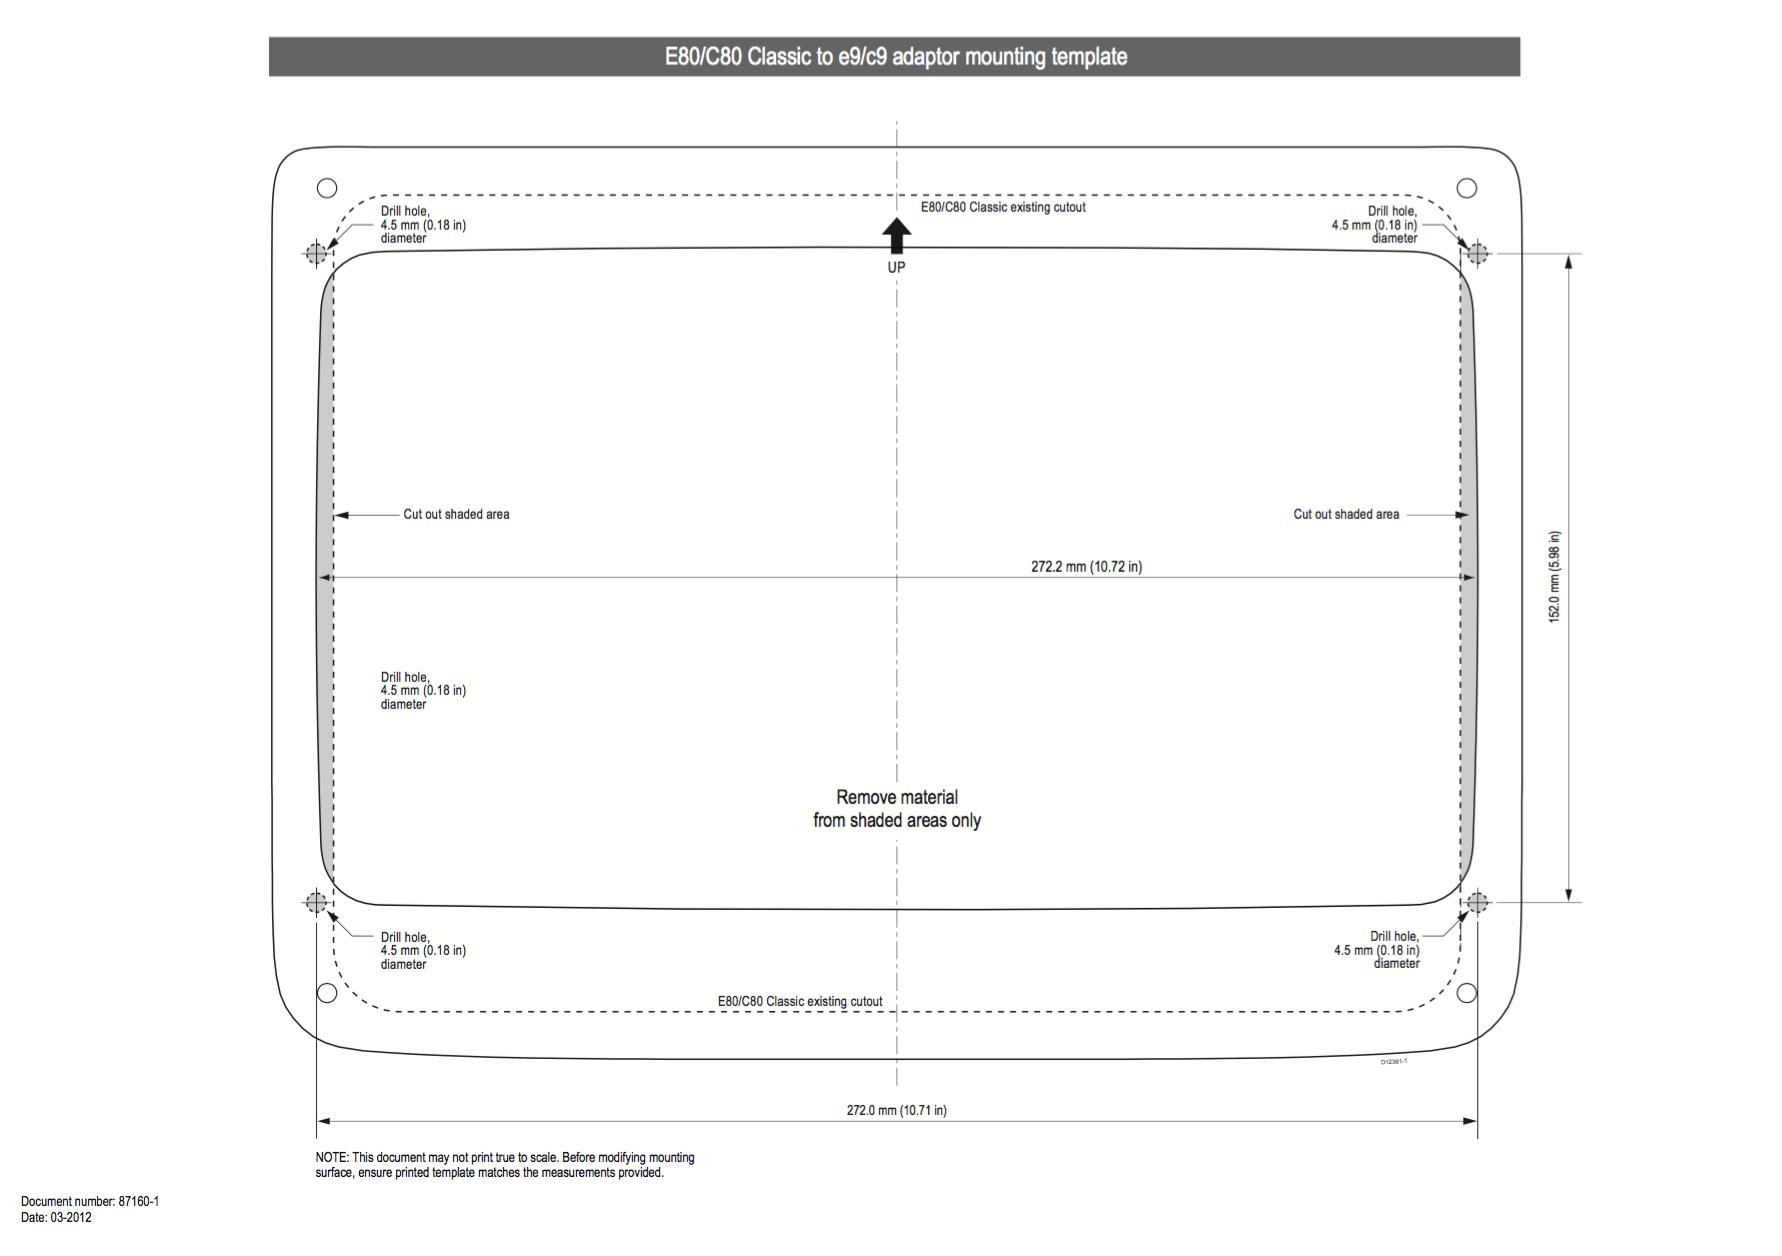 Garmin 541s Wiring Diagram Electrical Diagrams Gps 2006c 3205 In Depth U2022 Boston Whaler